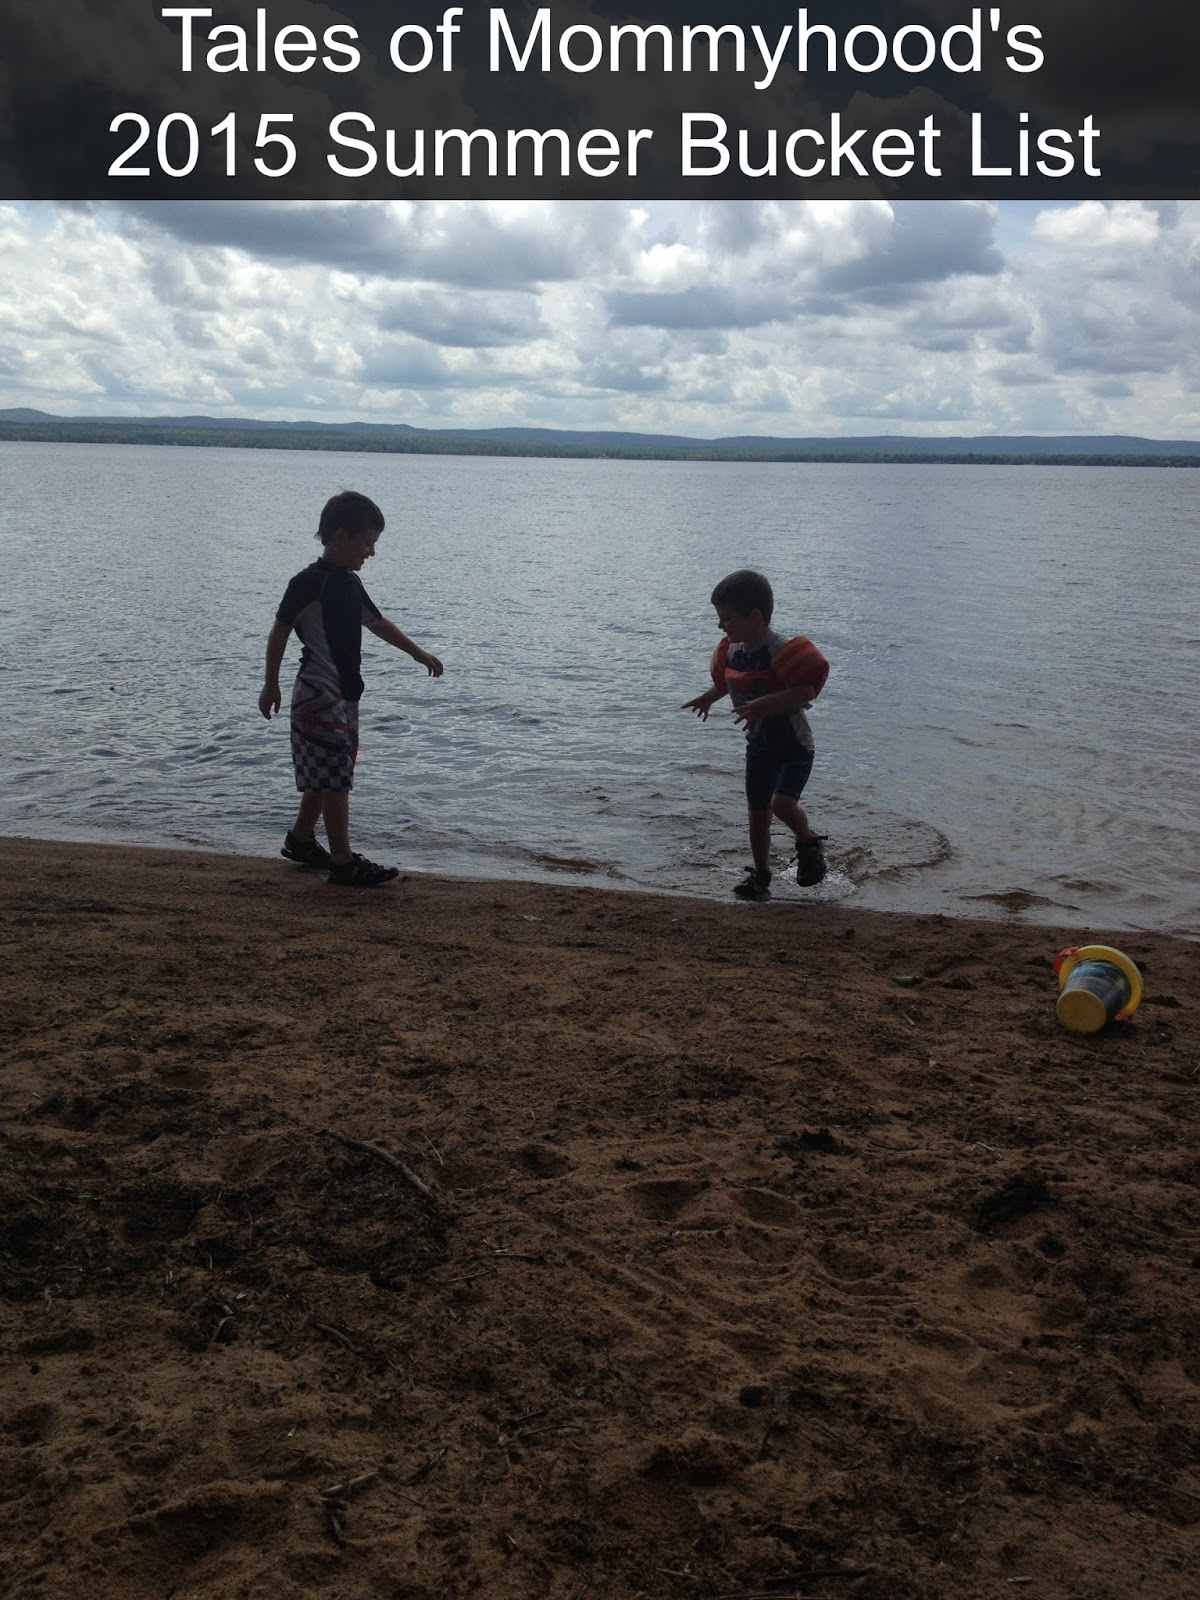 Tales of Mommyhood: Summer Bucket List - Update Week 5